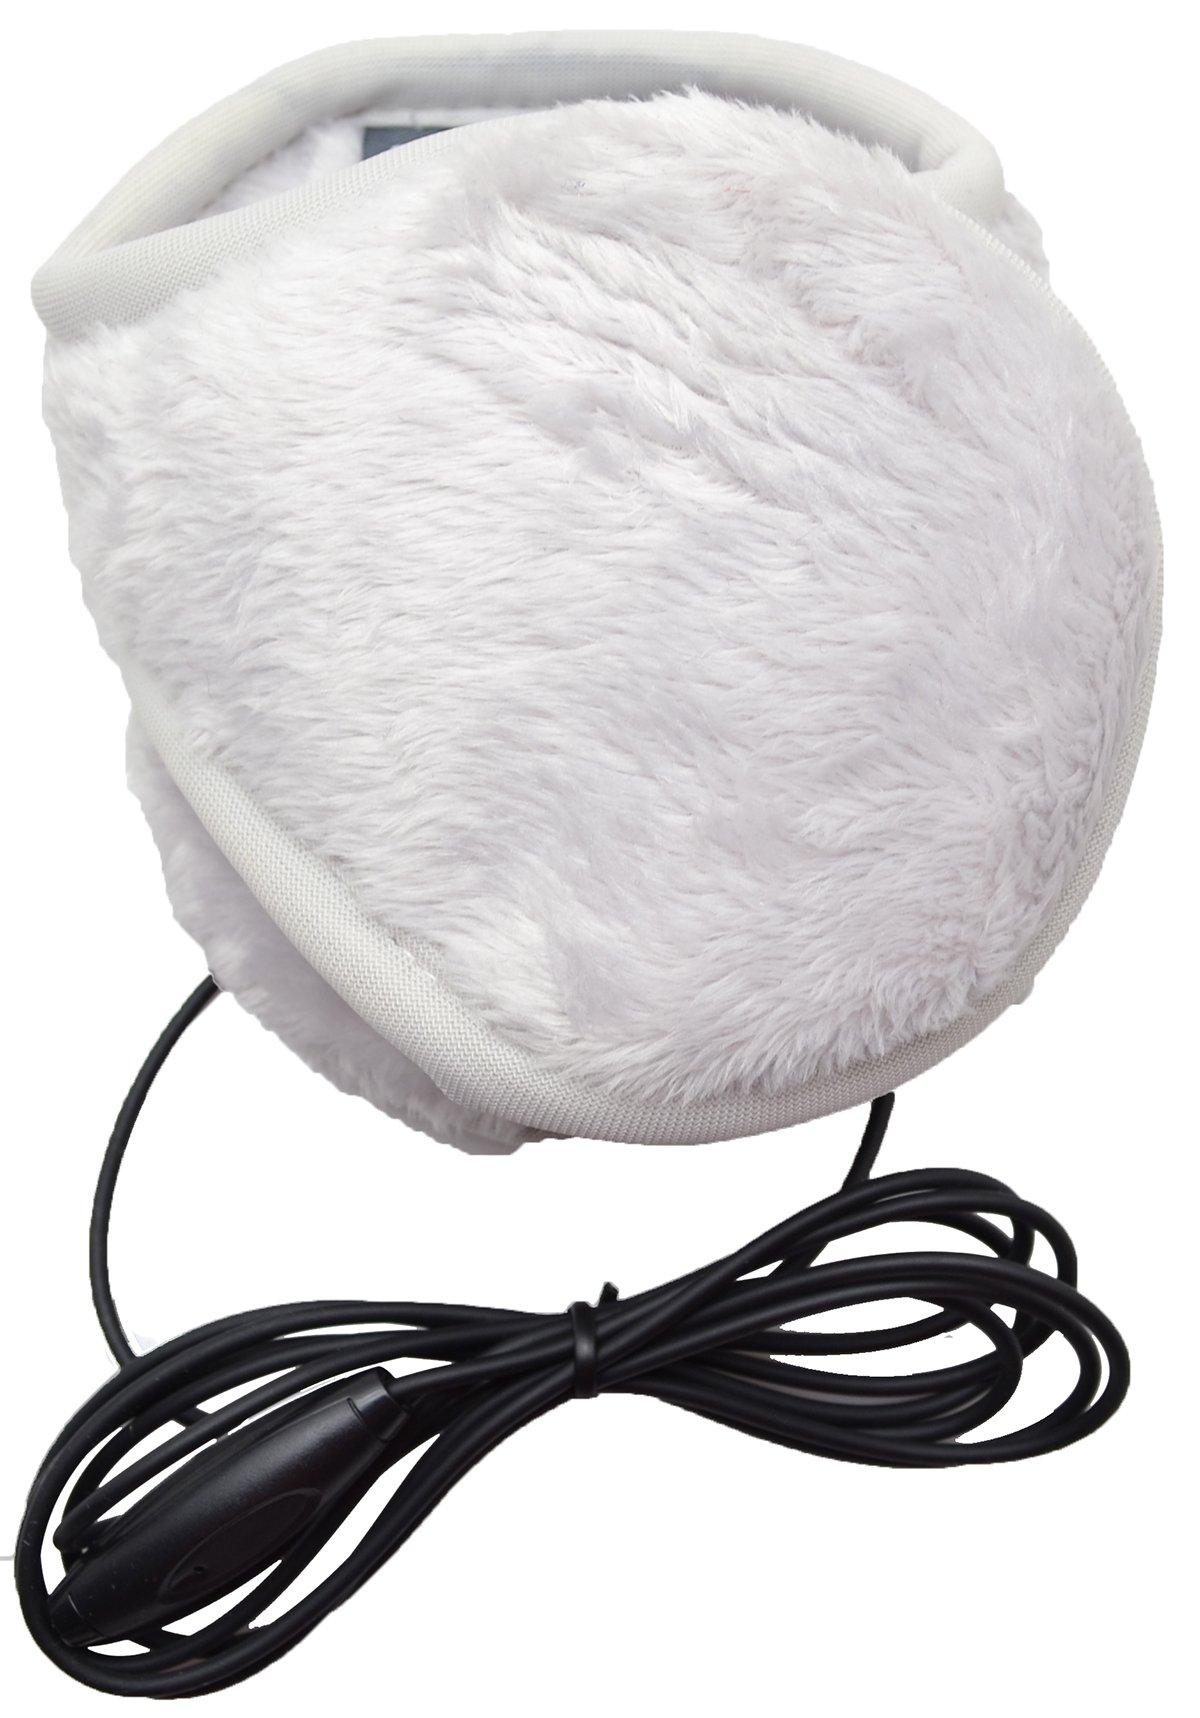 180s Women's Ear Warmers with Quantum Sound - Lush Fleece Frost Light Gray